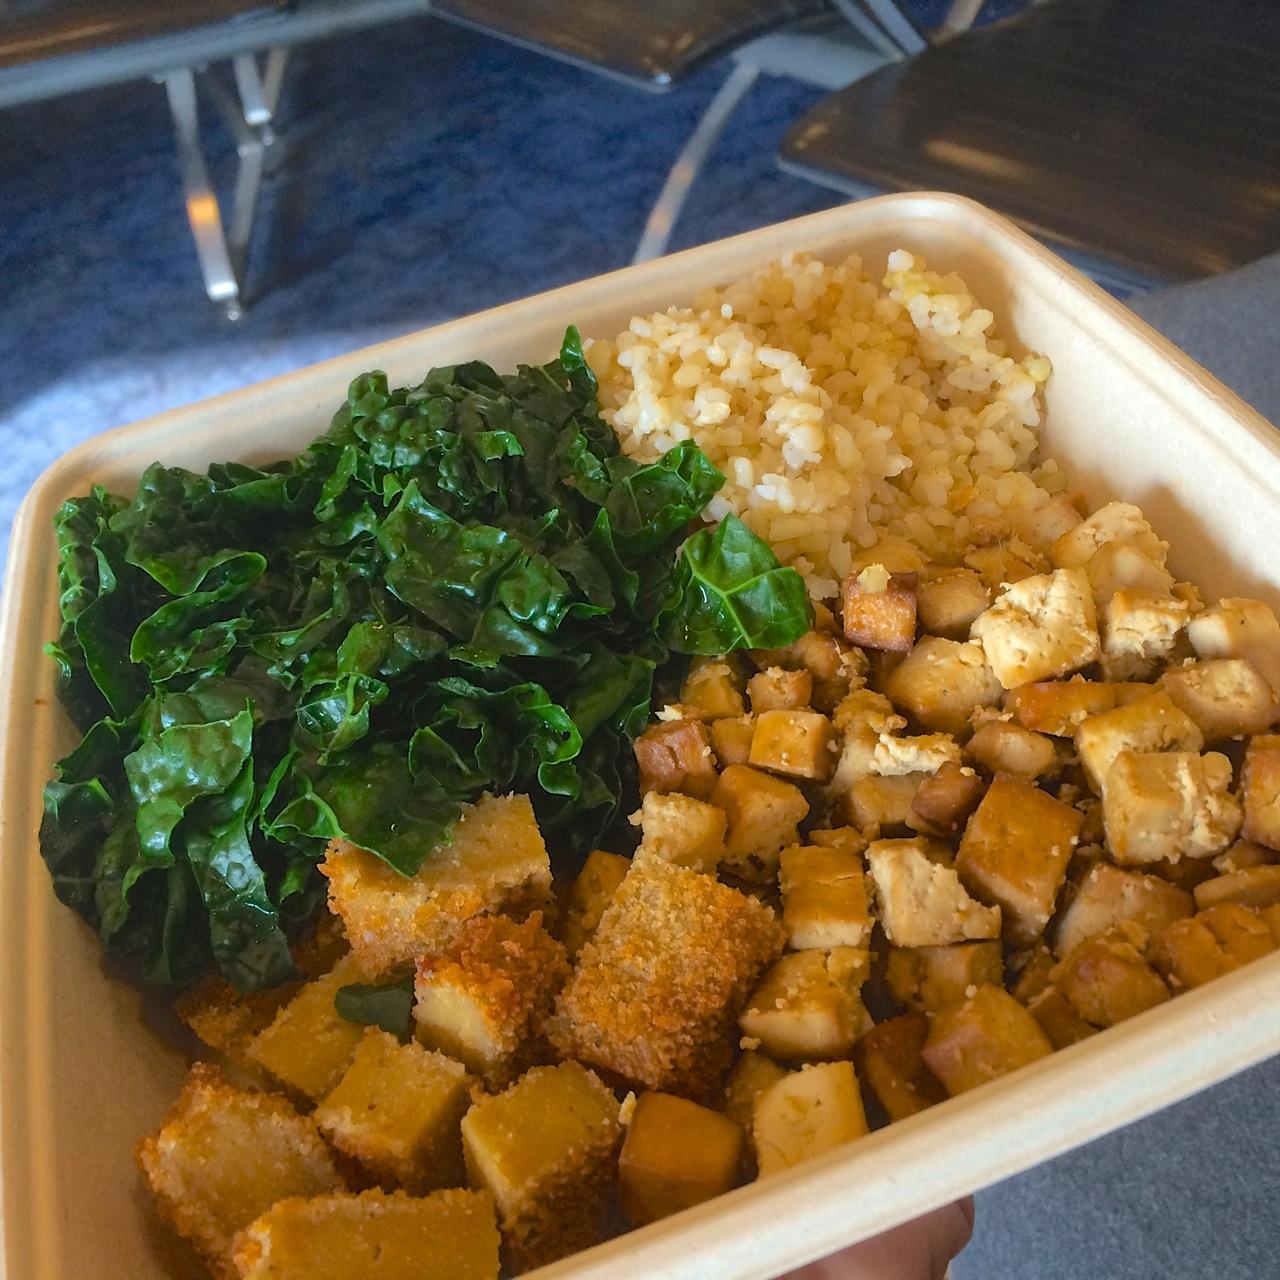 http://i0.wp.com/fatgayvegan.com/wp-content/uploads/2015/06/bowl-real-food-daily.jpg?fit=1280%2C1280